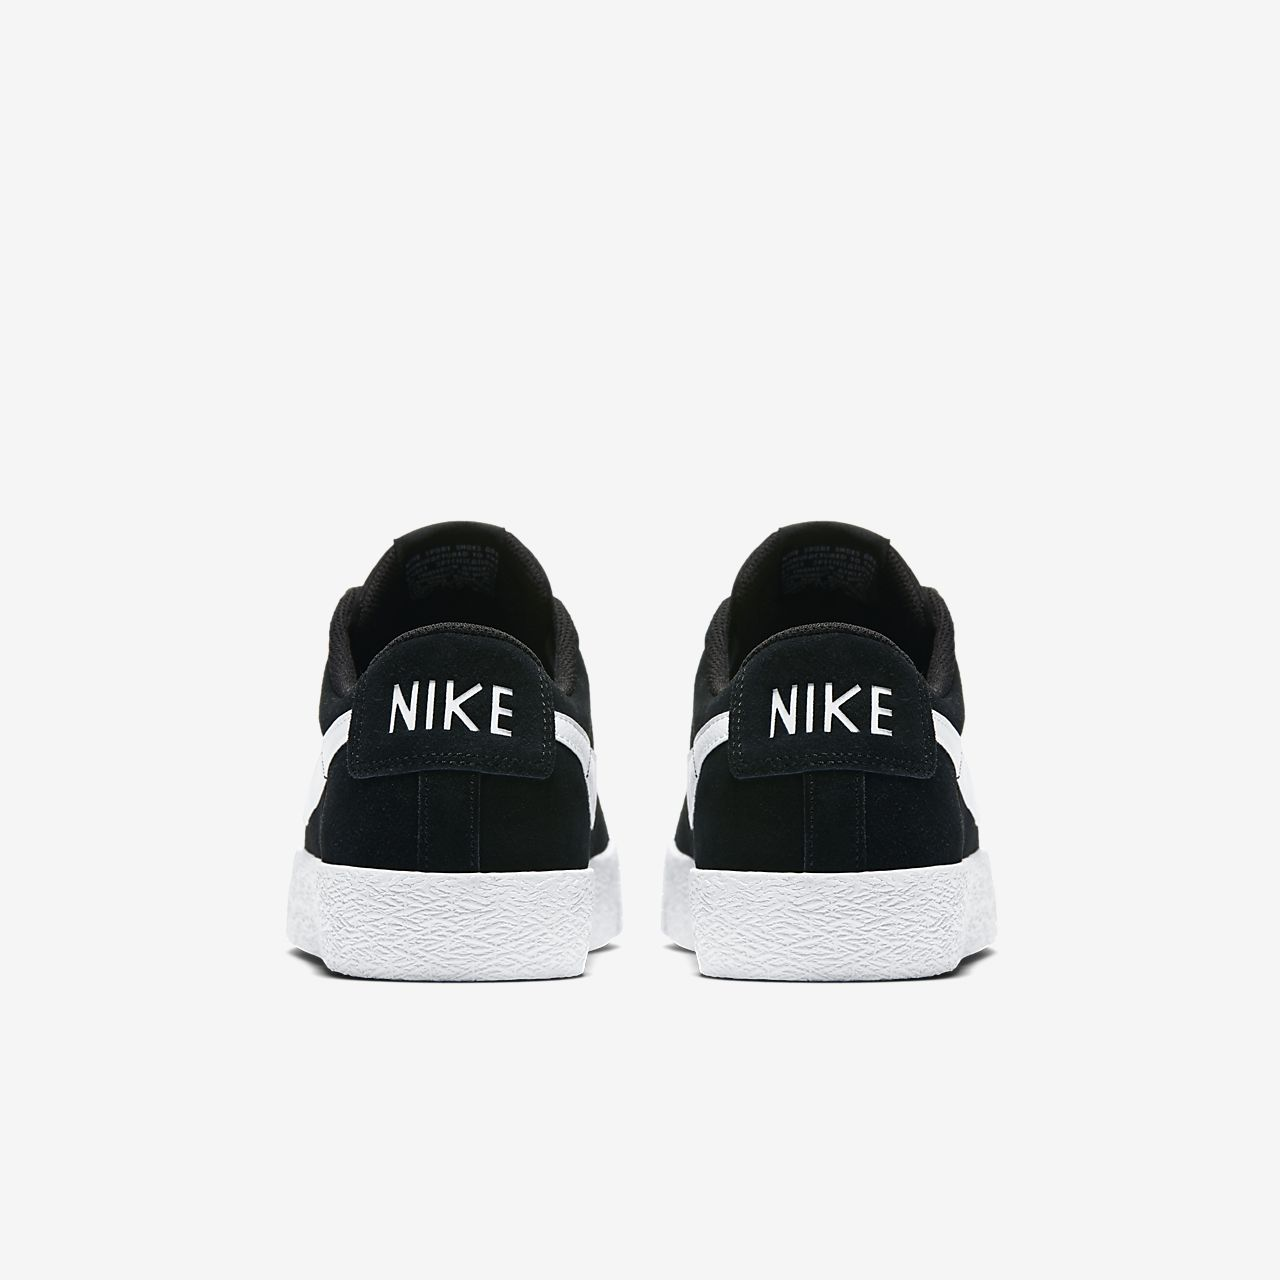 new style 42bcc 88e09 ... Nike SB Blazer Zoom Low-skatersko til mænd